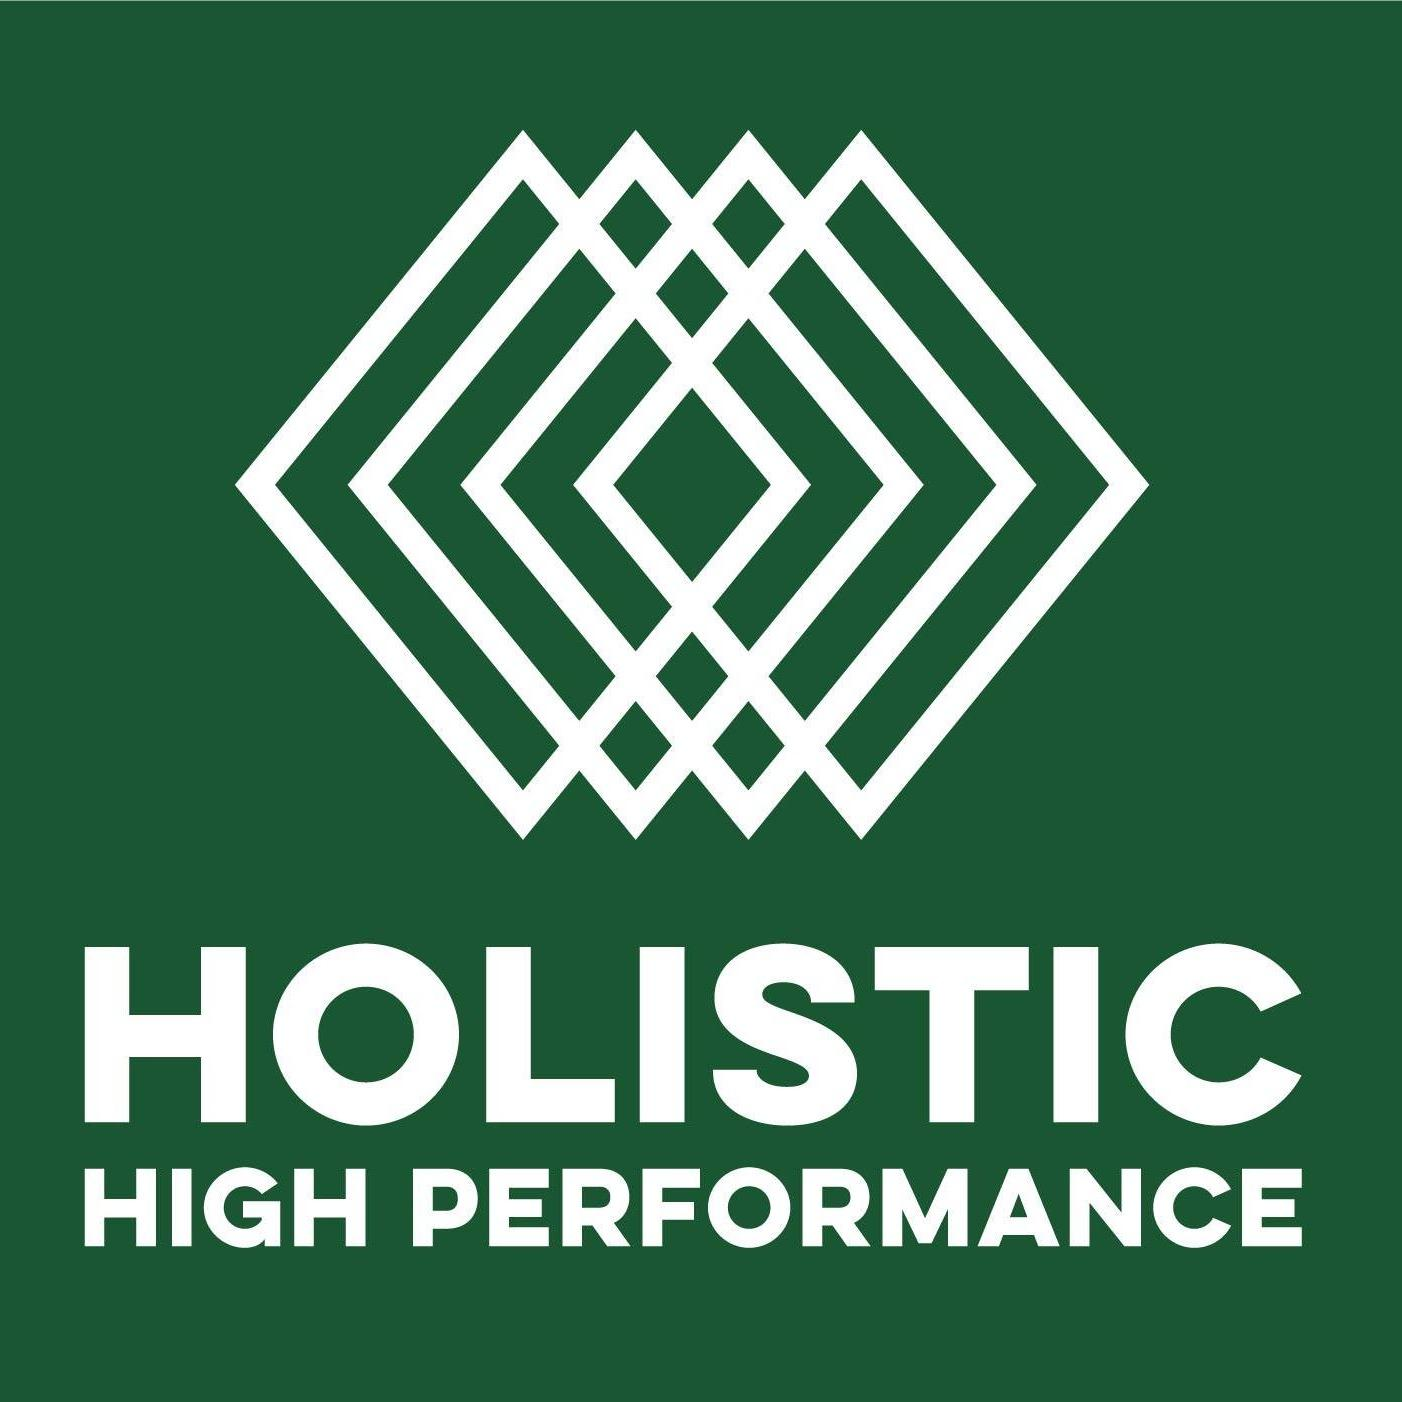 Holistic High Performance LLC